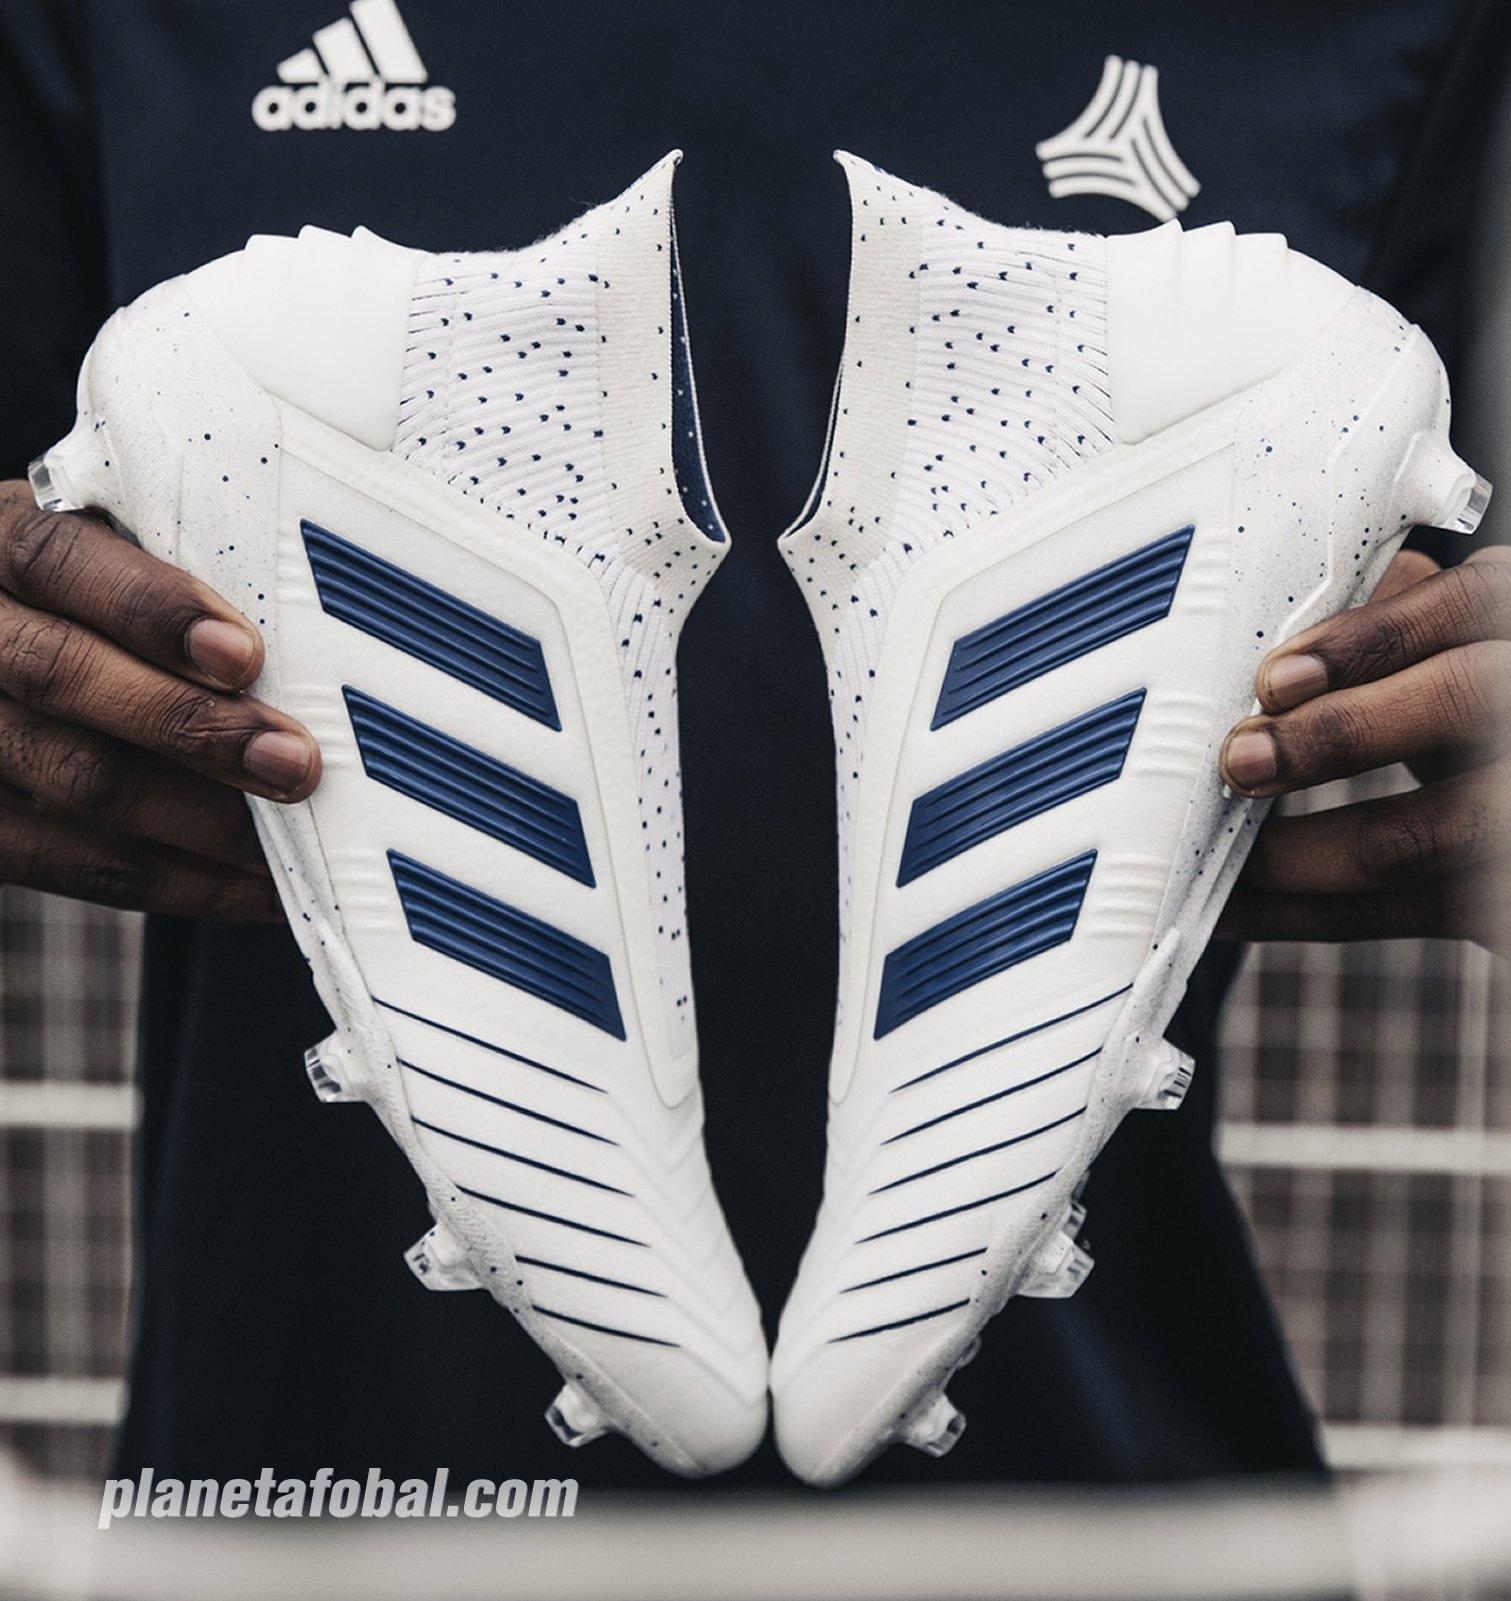 Botines Predator del Virtuso Pack | Adidas